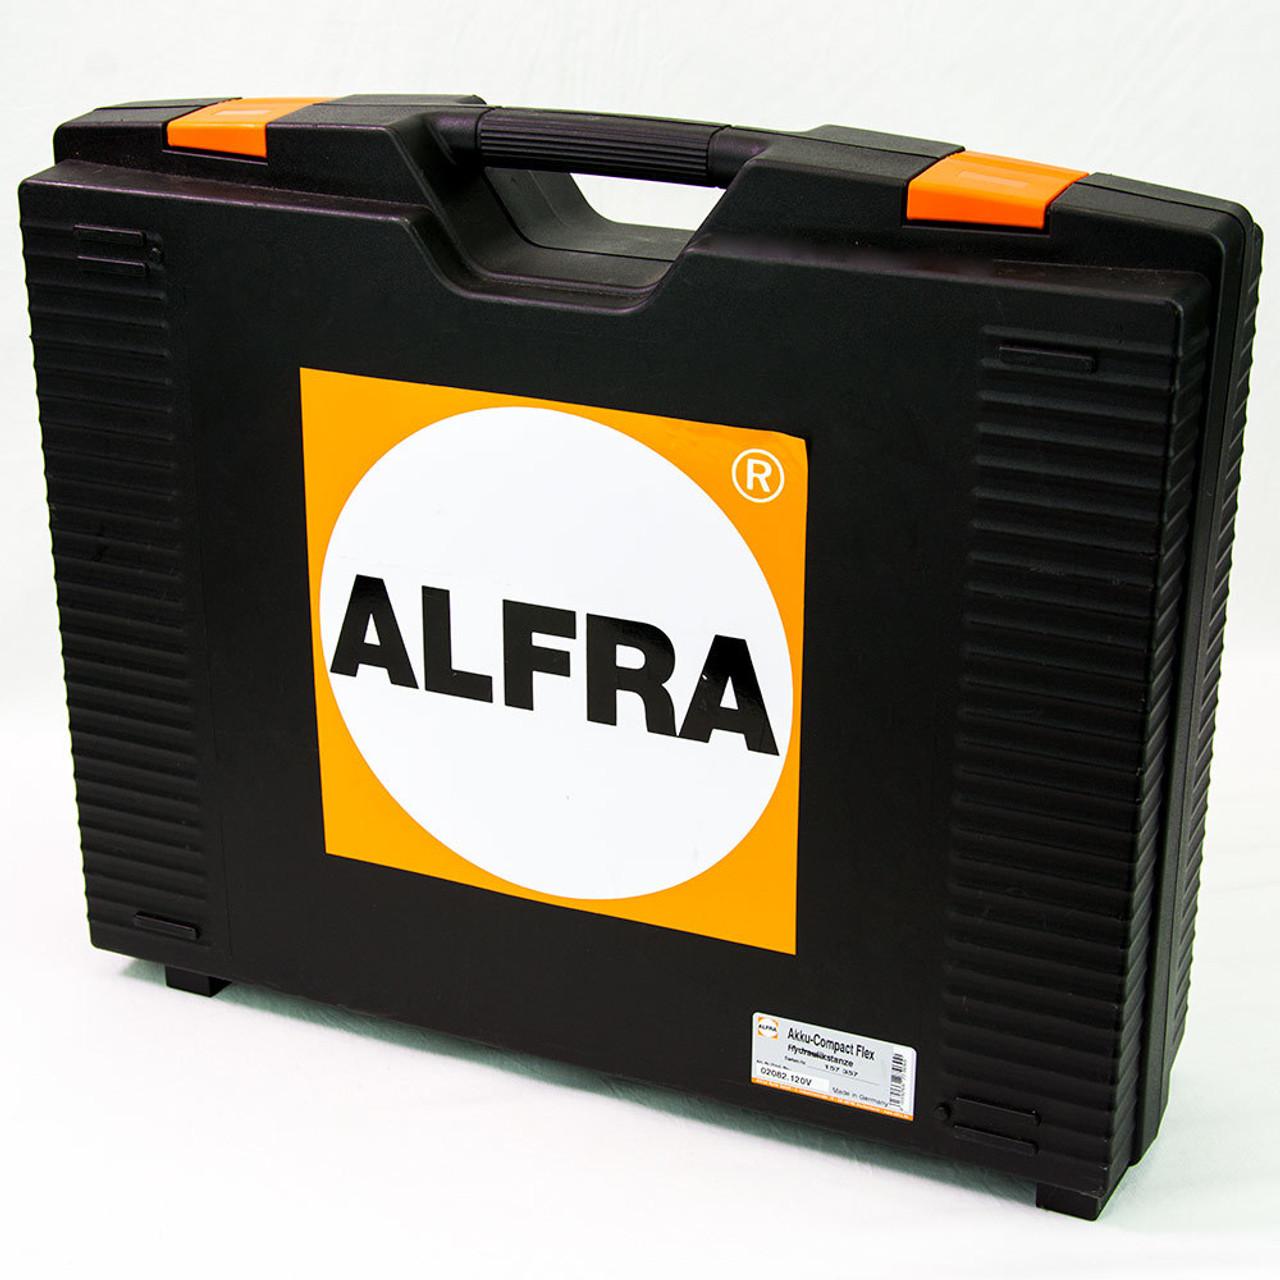 "Alfra AKKU-Compact Flex Battery Operated Punching Tool Kit w/1/2"" - 2"" Conduit punch/die sets (set of 6)"